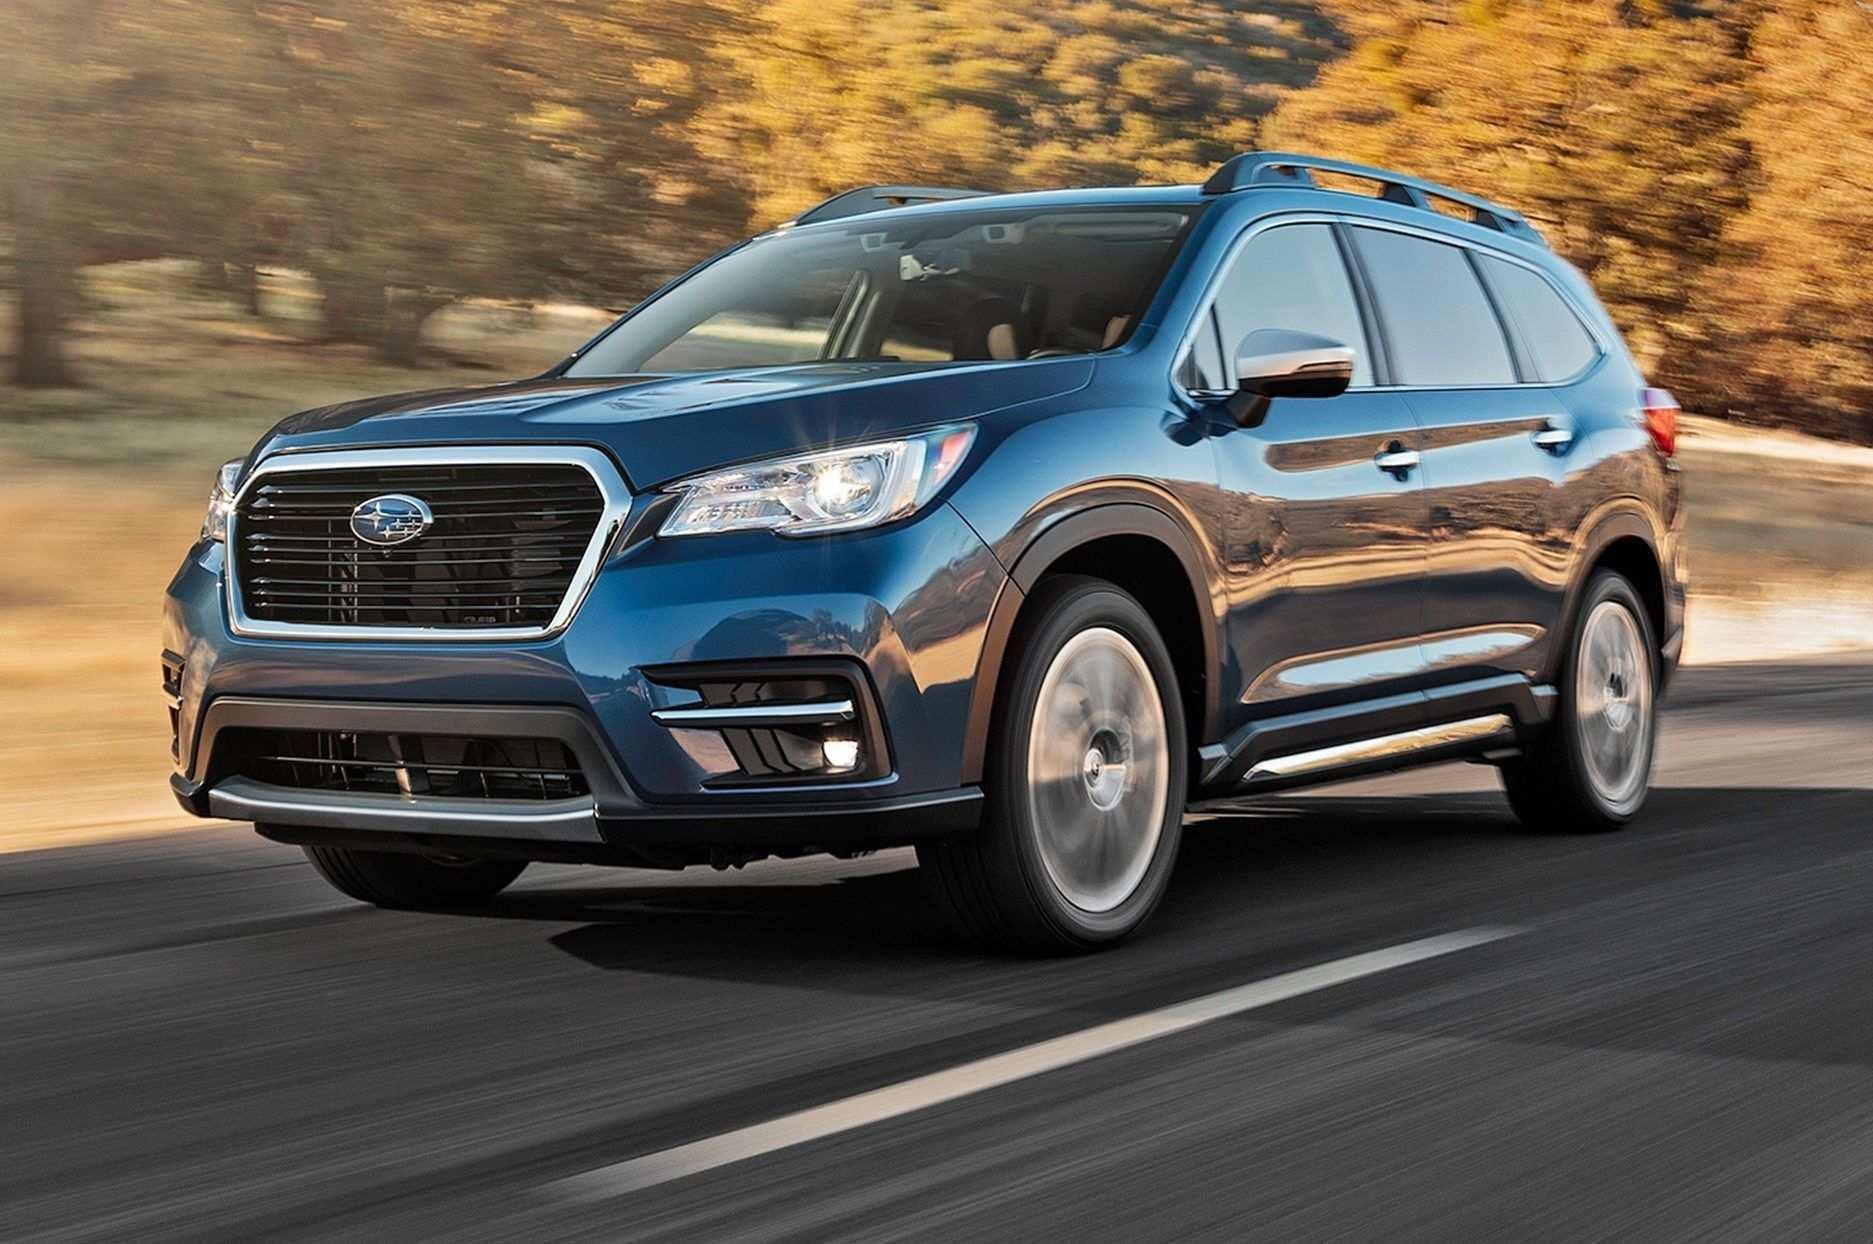 32 New Subaru Brat 2019 Exterior with Subaru Brat 2019